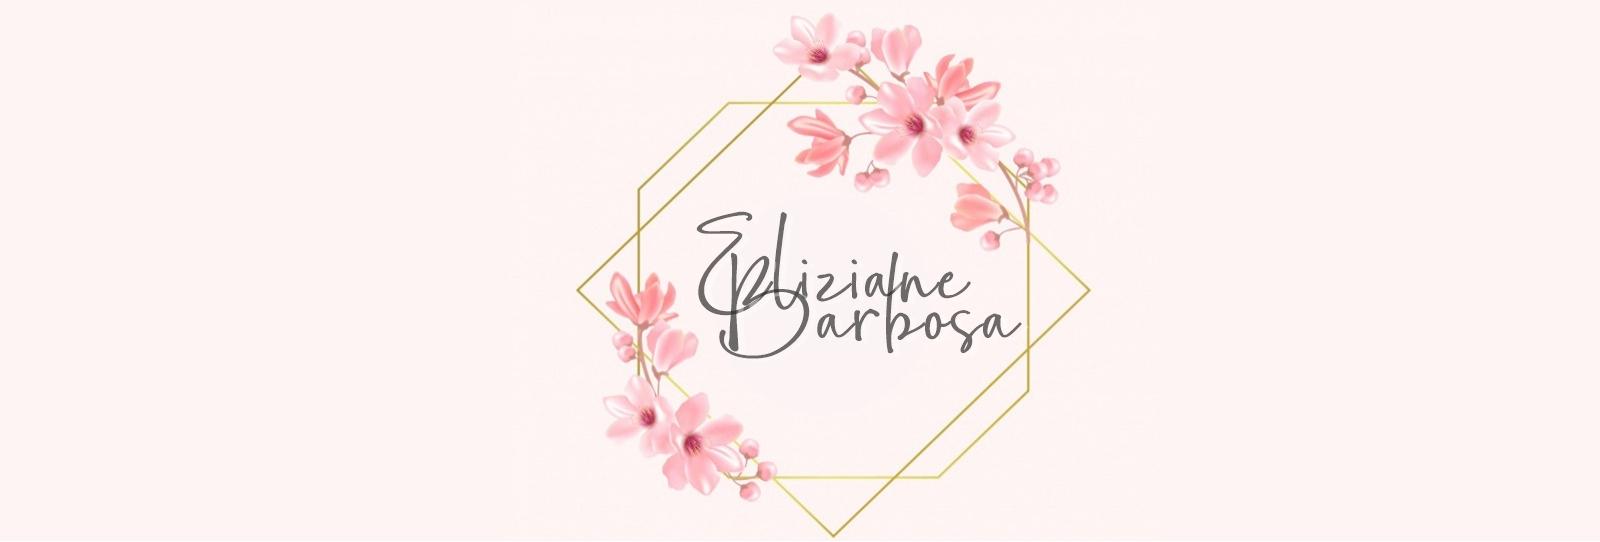 http://www.elizianebarbosa.com/search/label/Resenha%20Liter%C3%A1ria